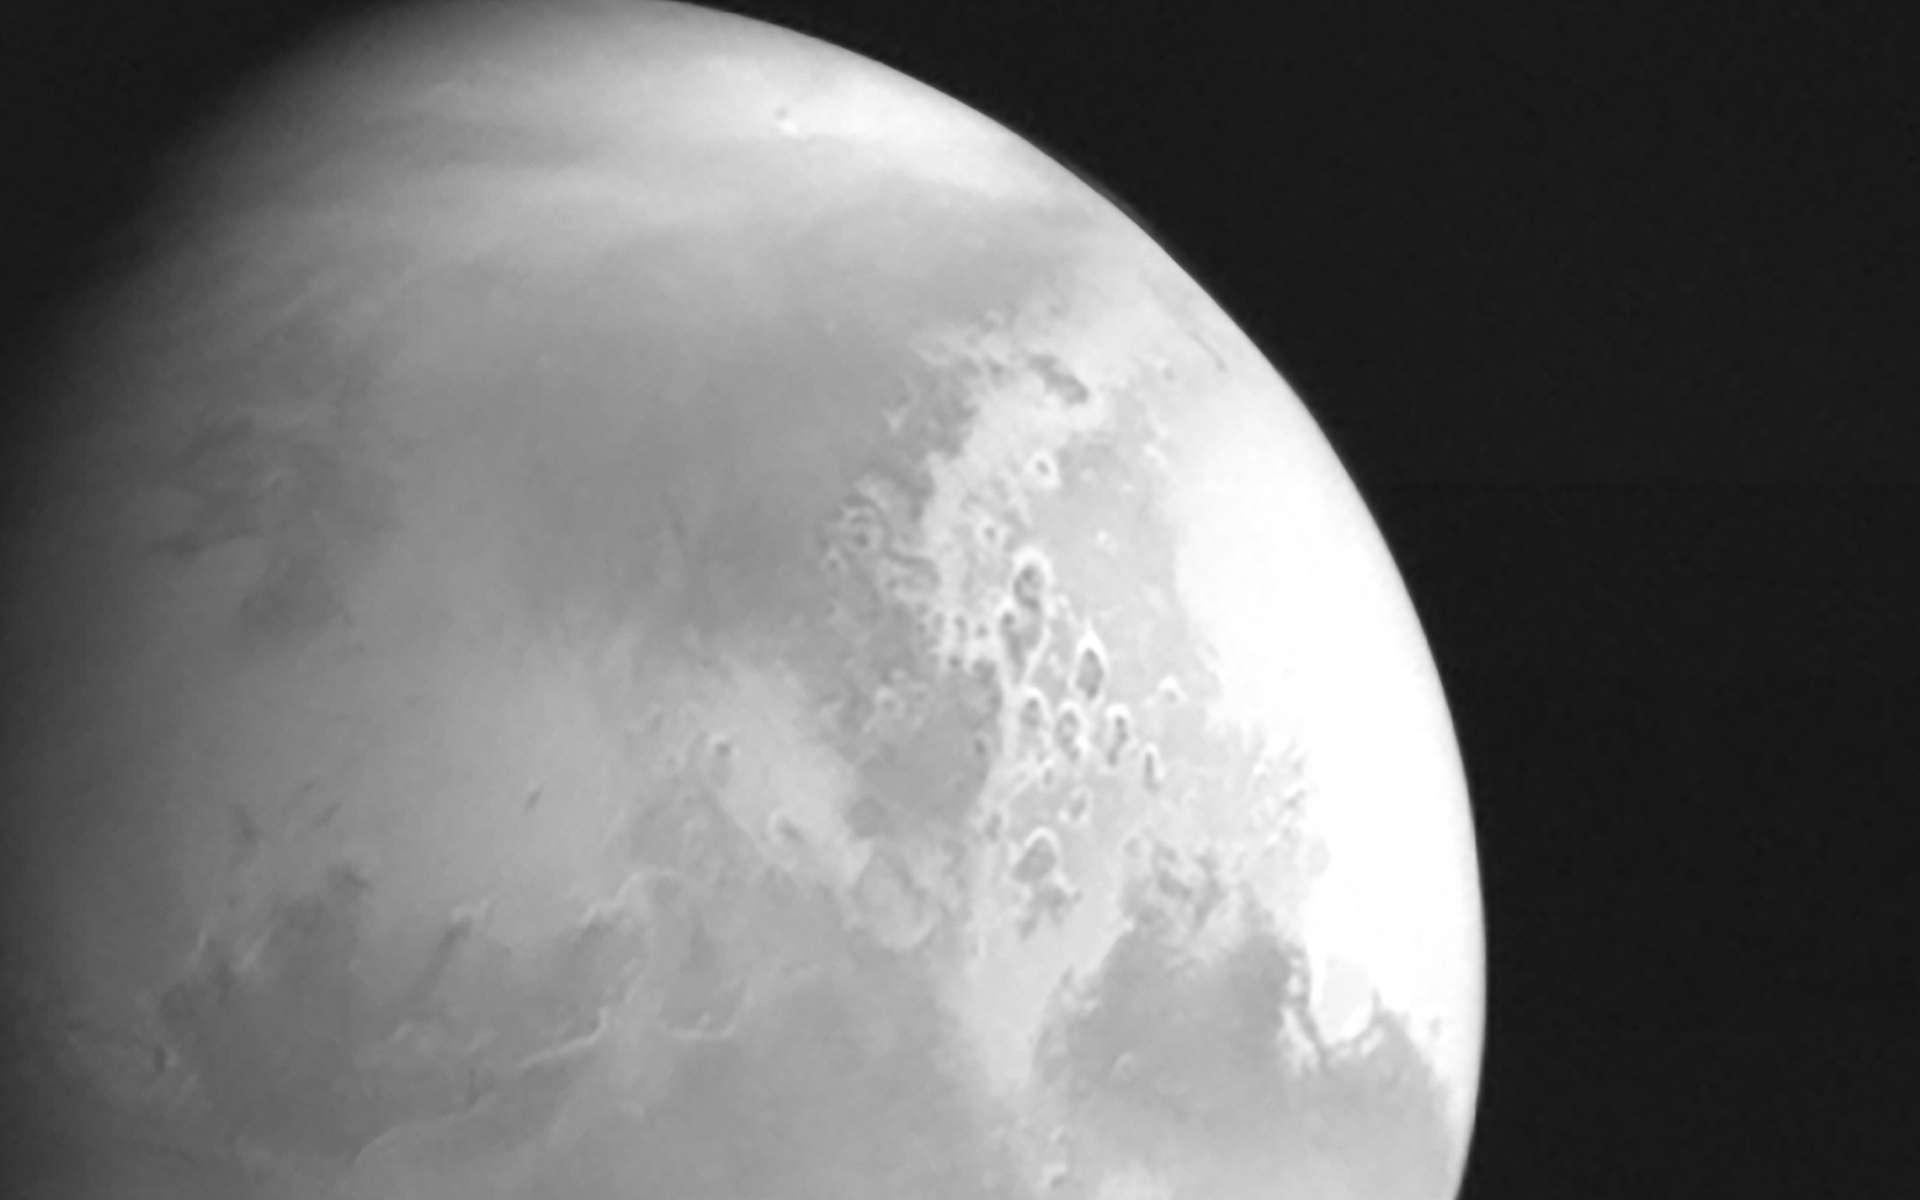 Mars : la Chine réussit l'insertion en orbite de sa sonde spatiale Tianwen-1 - Futura